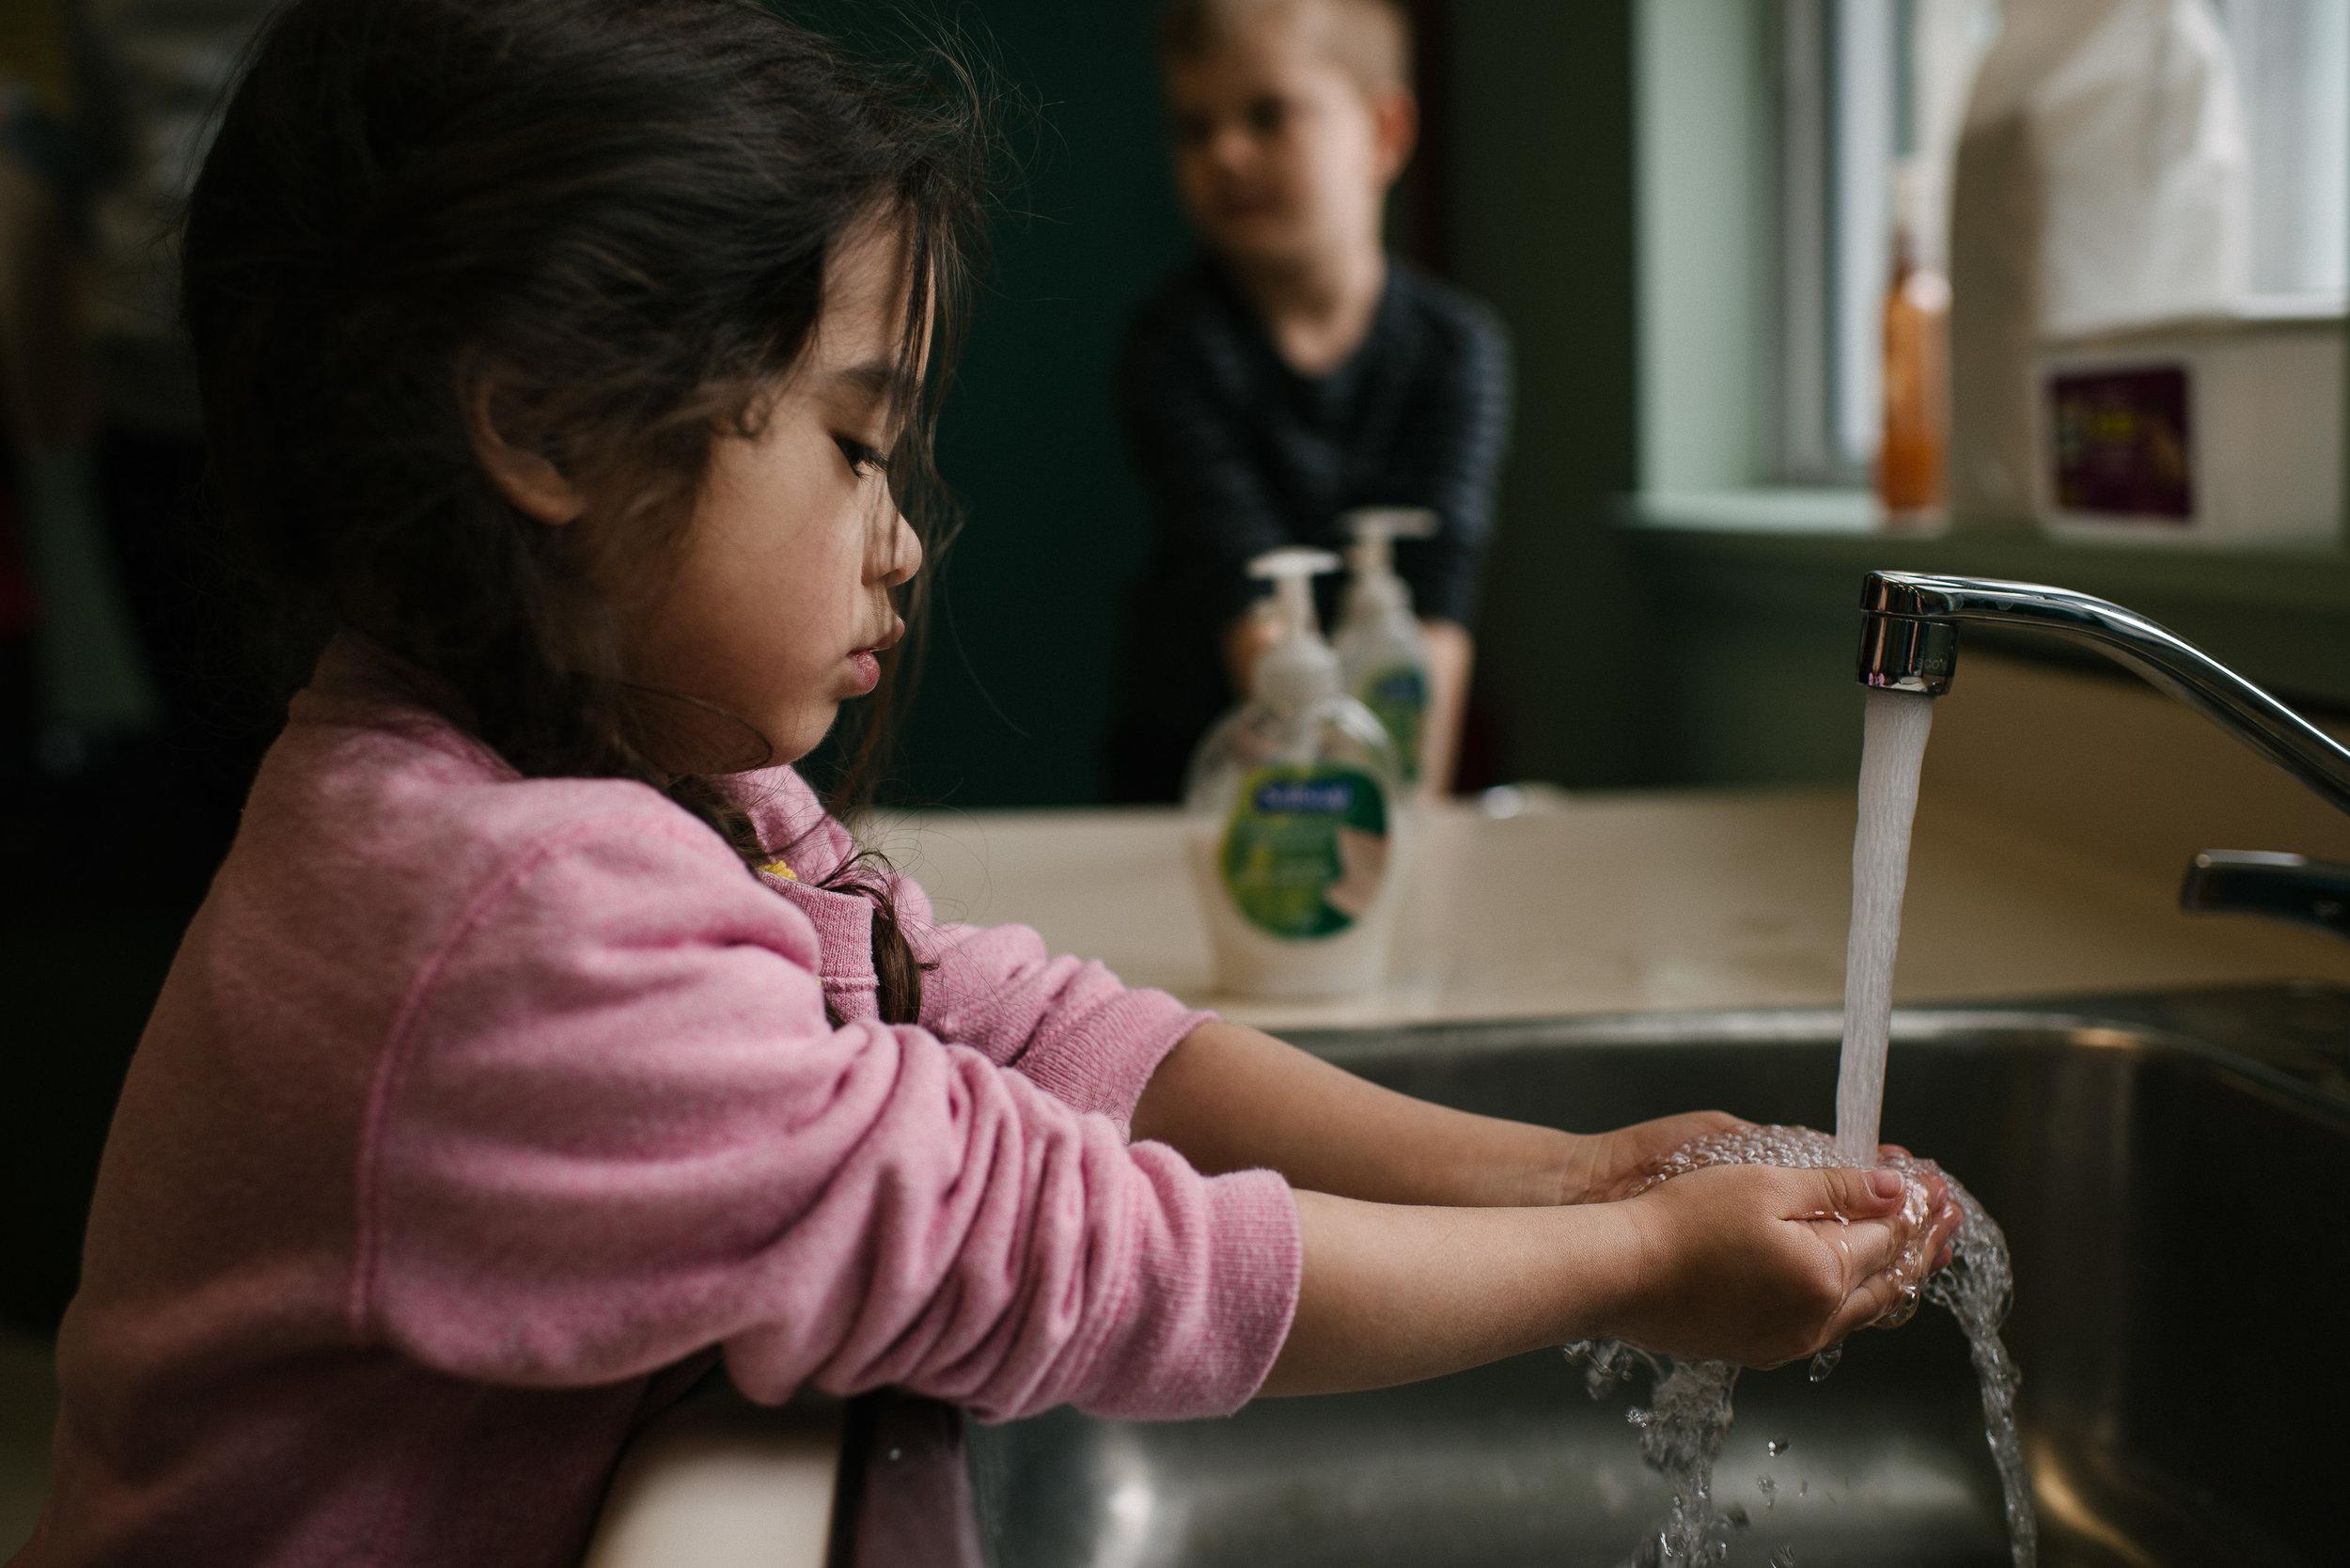 documentary school photography viara mileva kingston toronto ottawa-121929vm.jpg